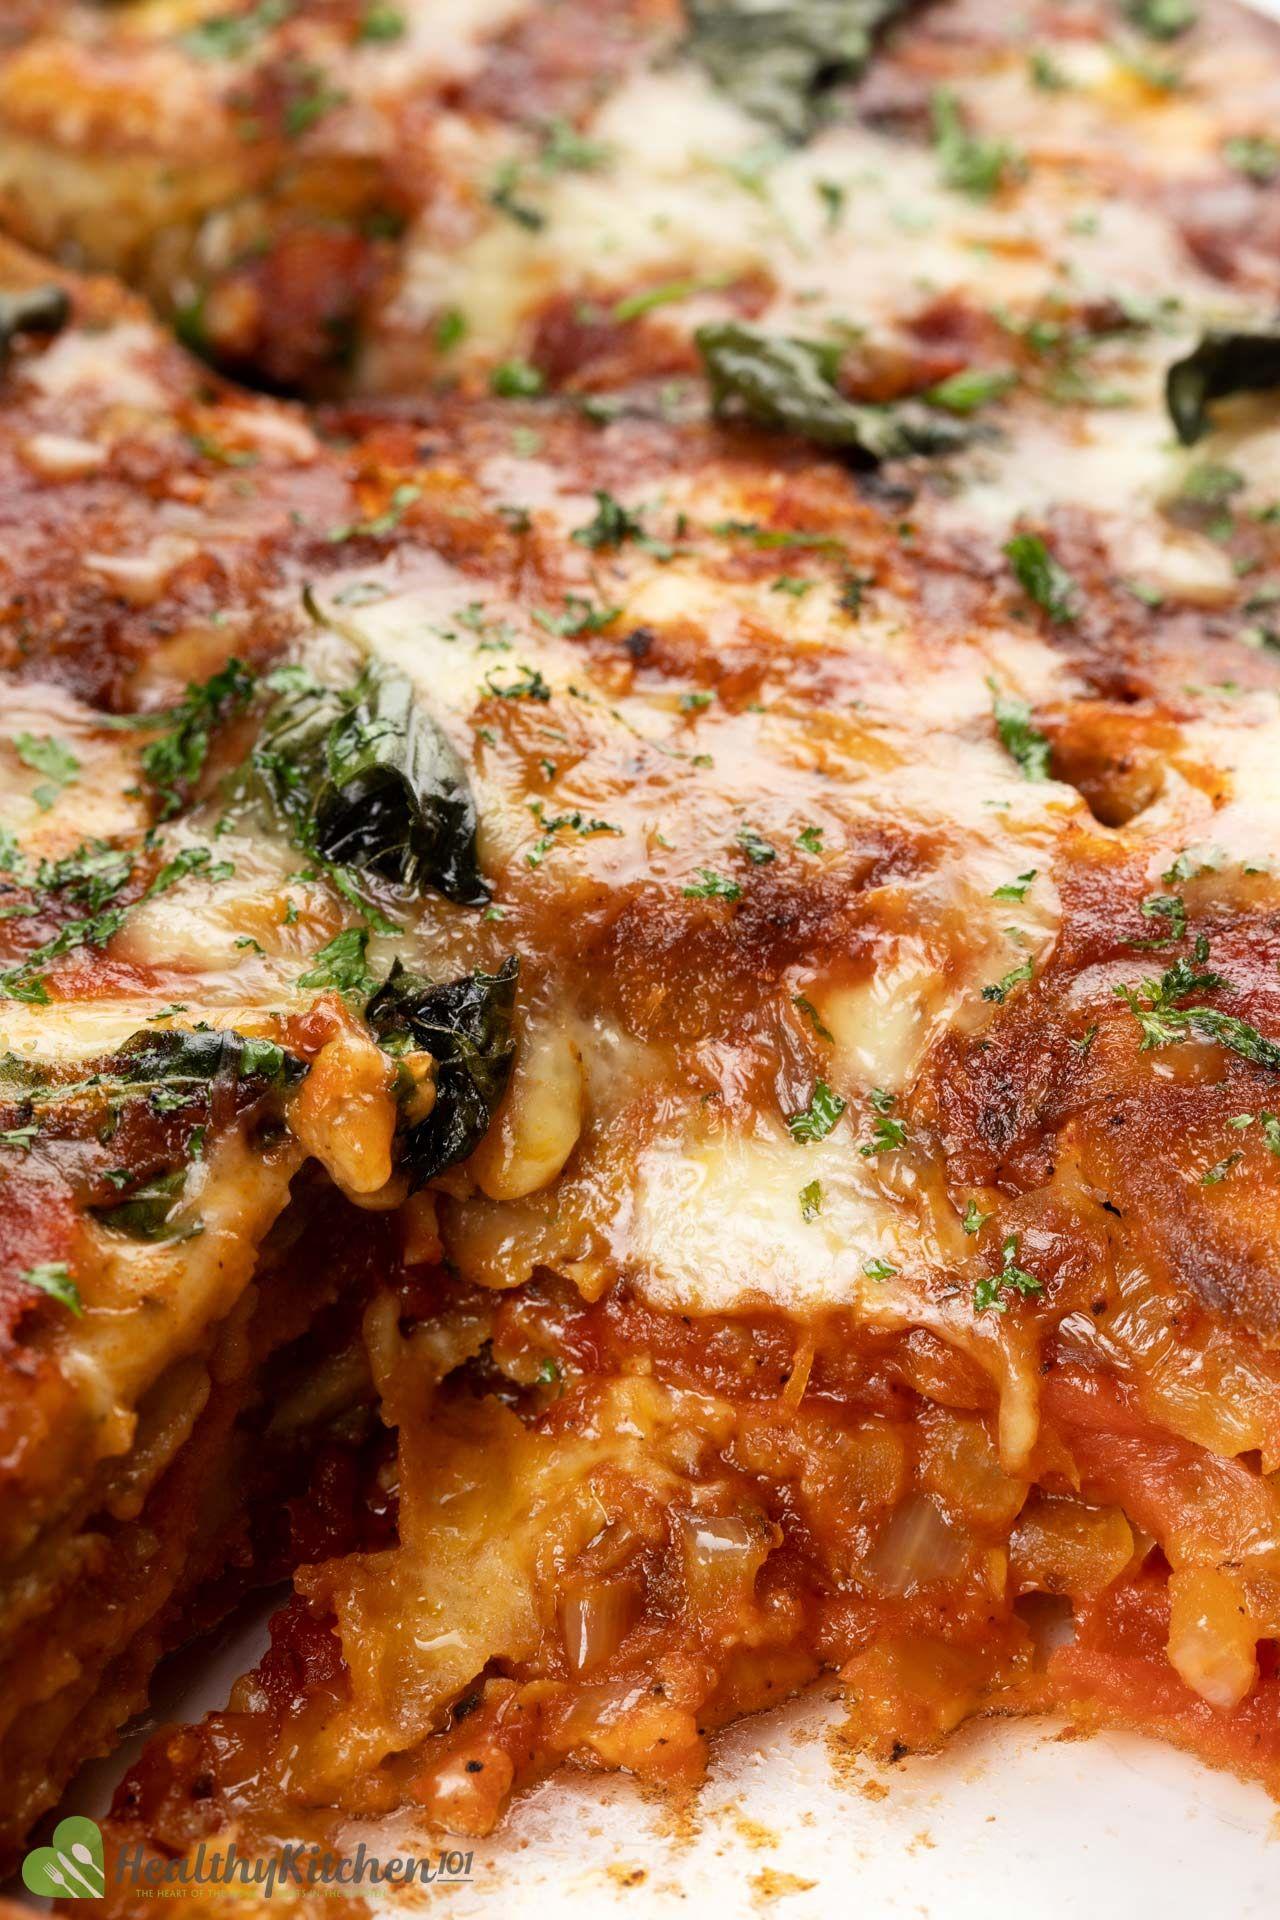 How to make homemade Eggplant Parmesan